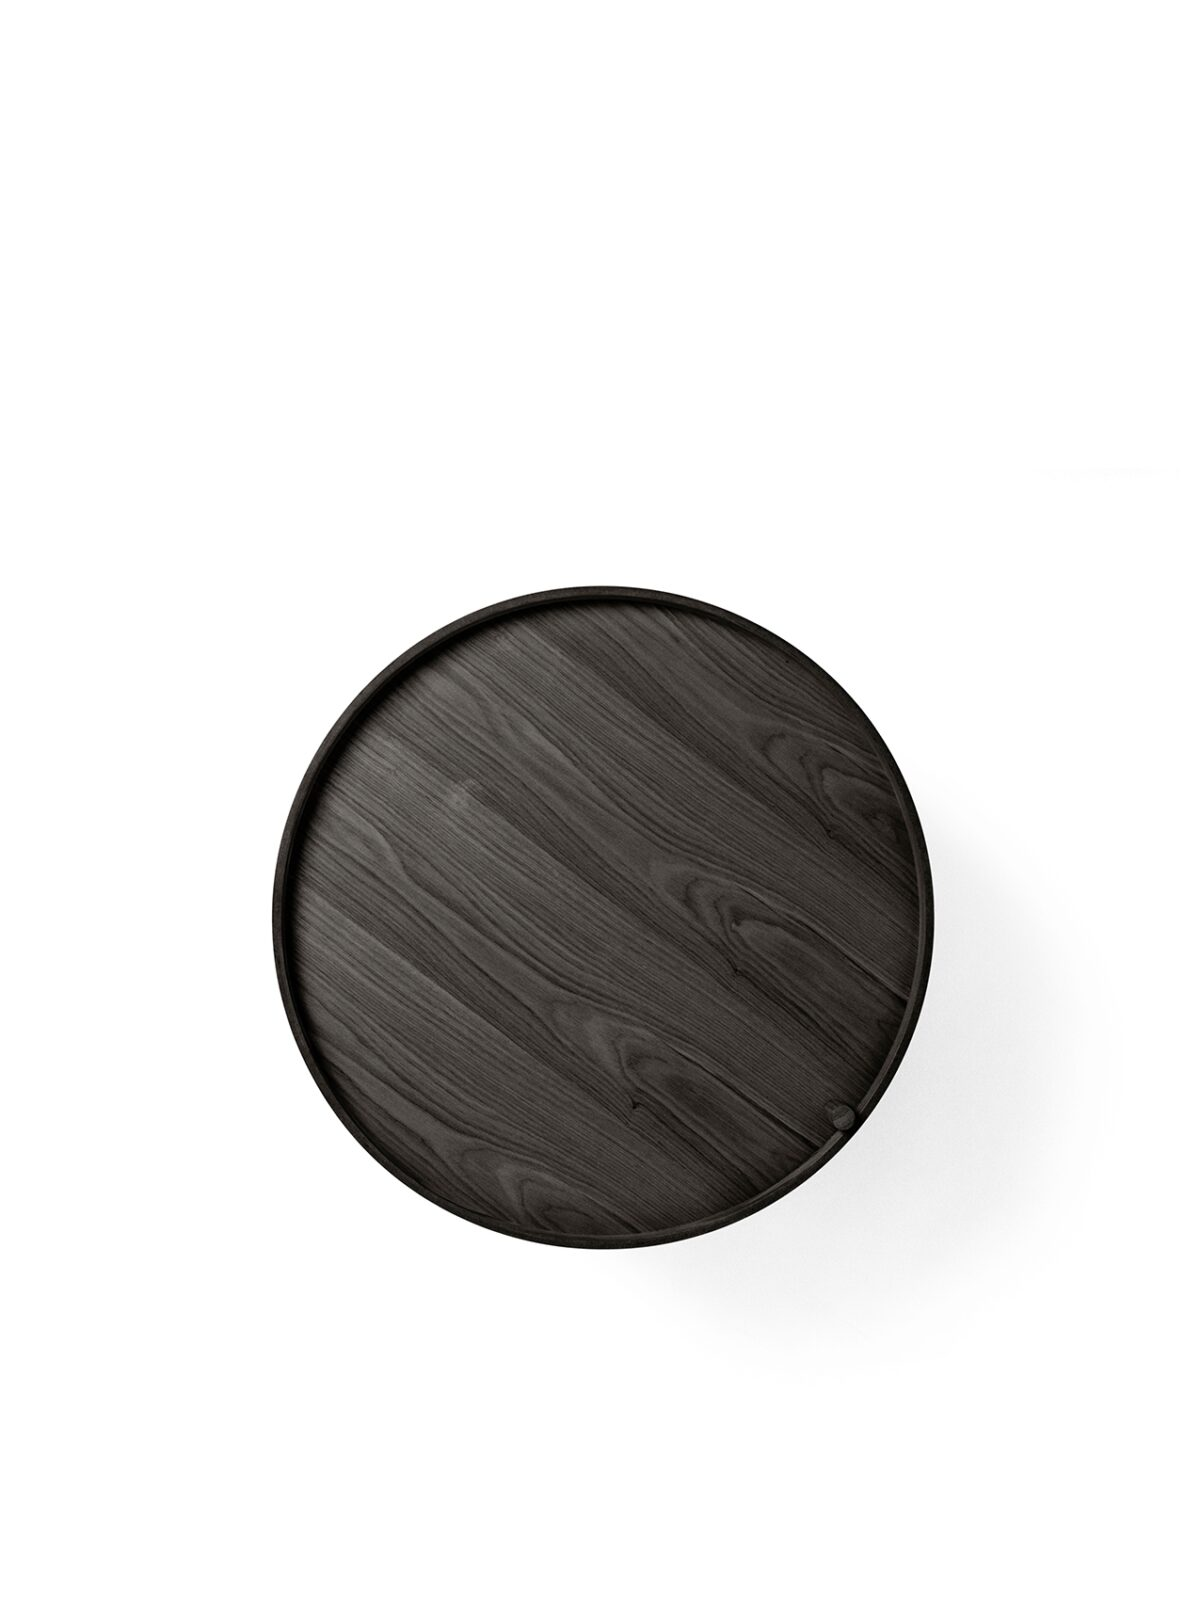 6900539 Turning Table Black Ash Theresa Arns2019 06 25 14 54 48 441 1